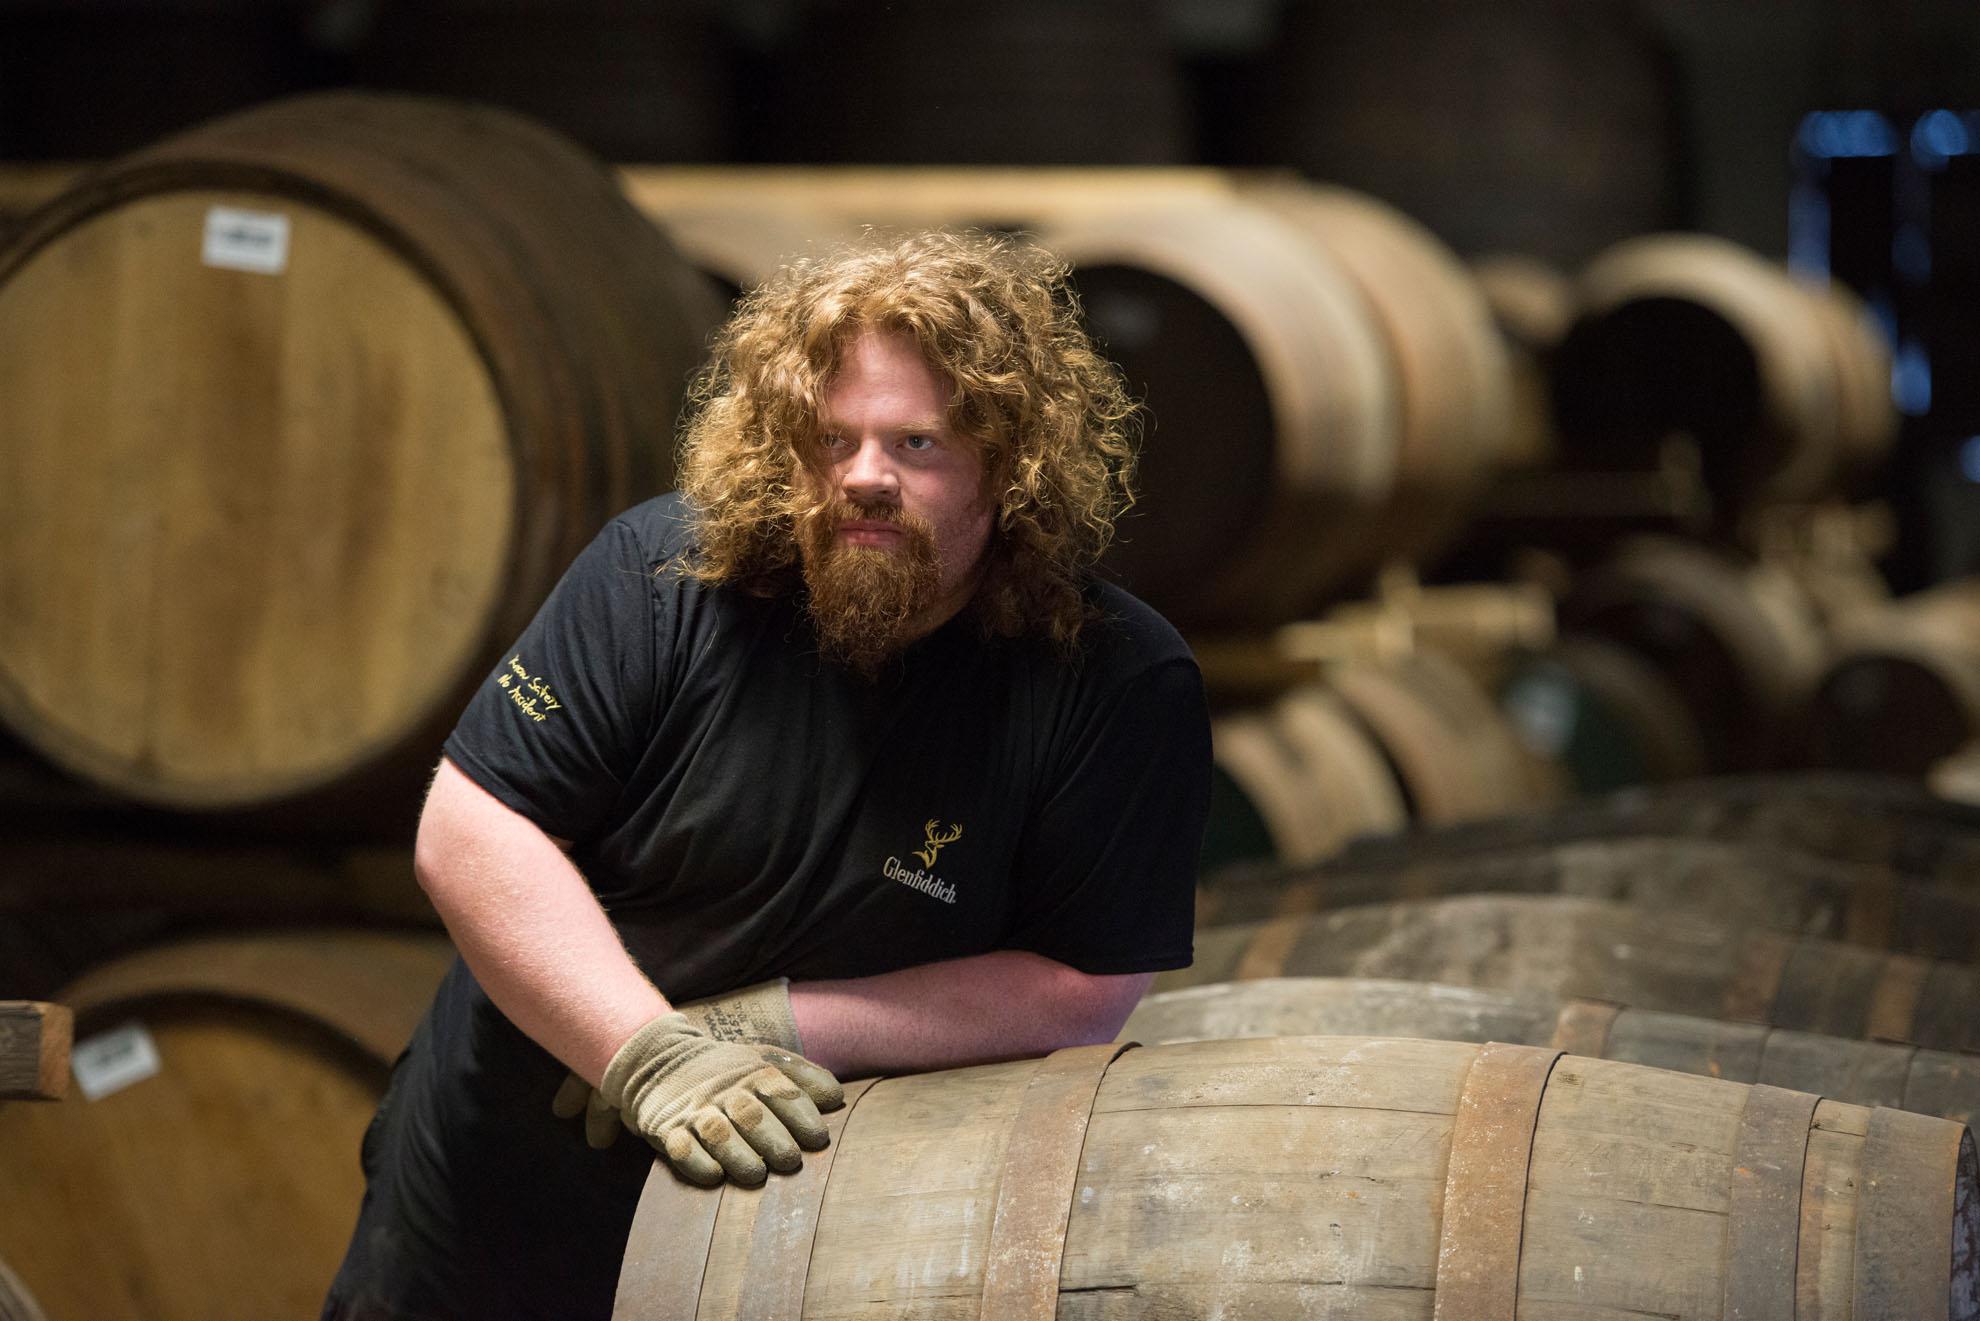 Glenfiddich distillery event photography